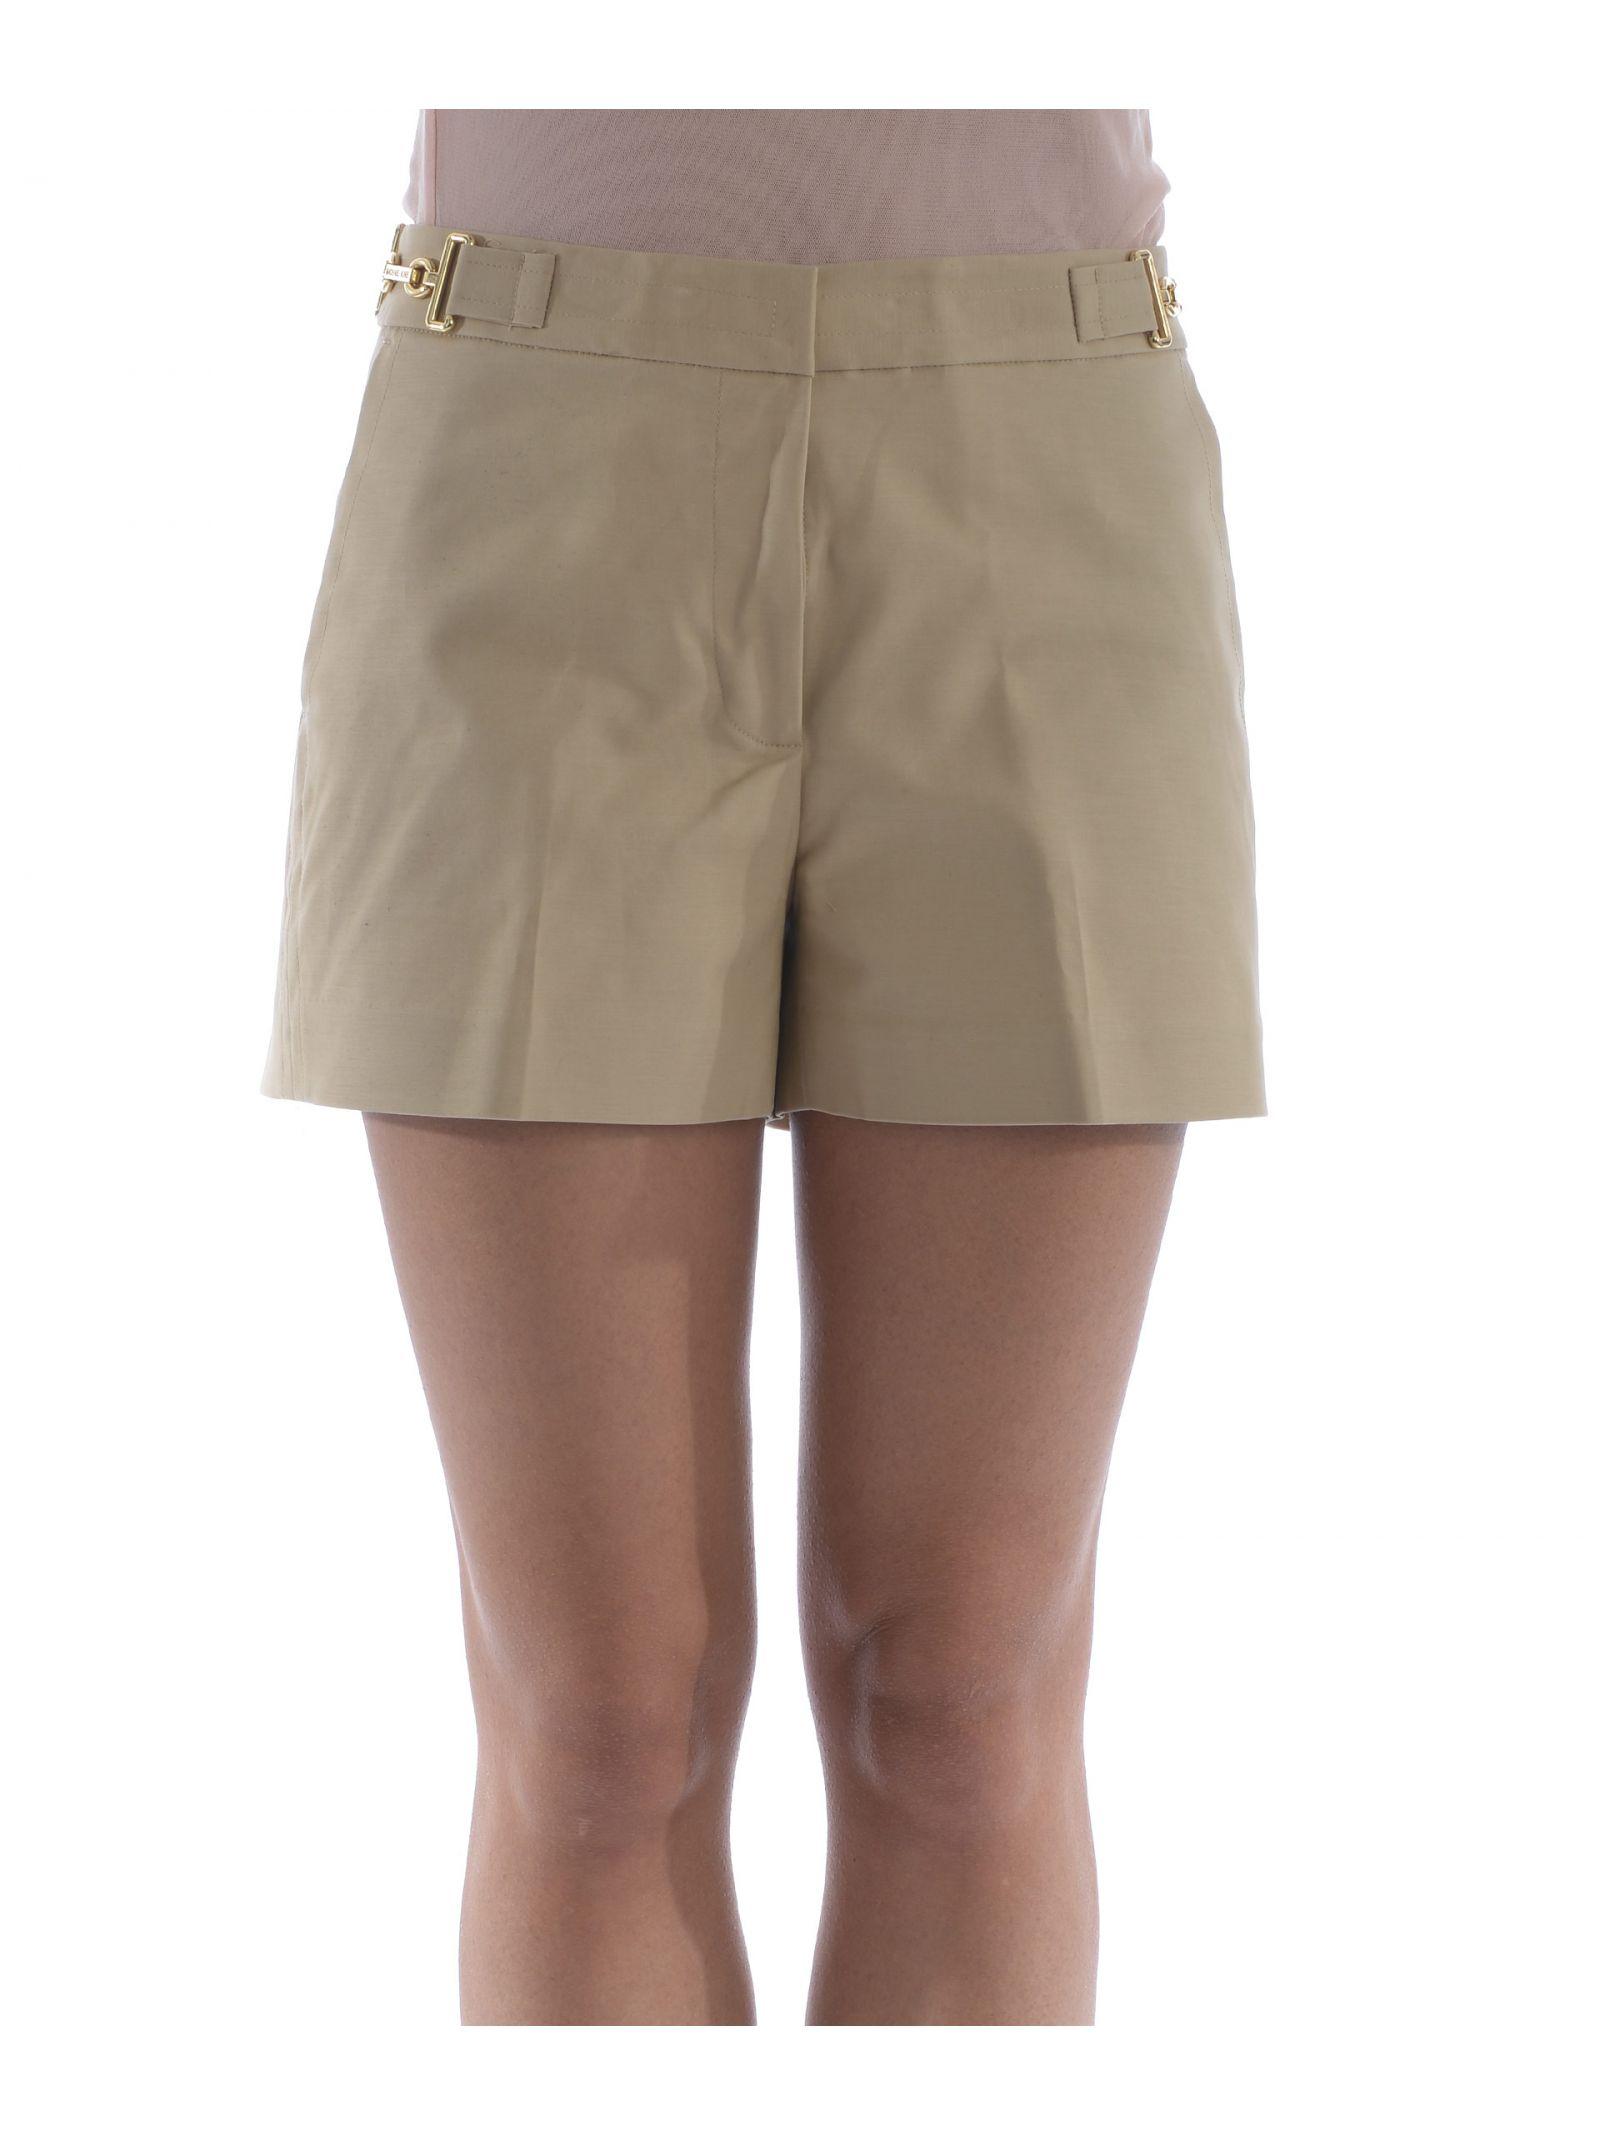 michael kors female michael kors high waisted shorts